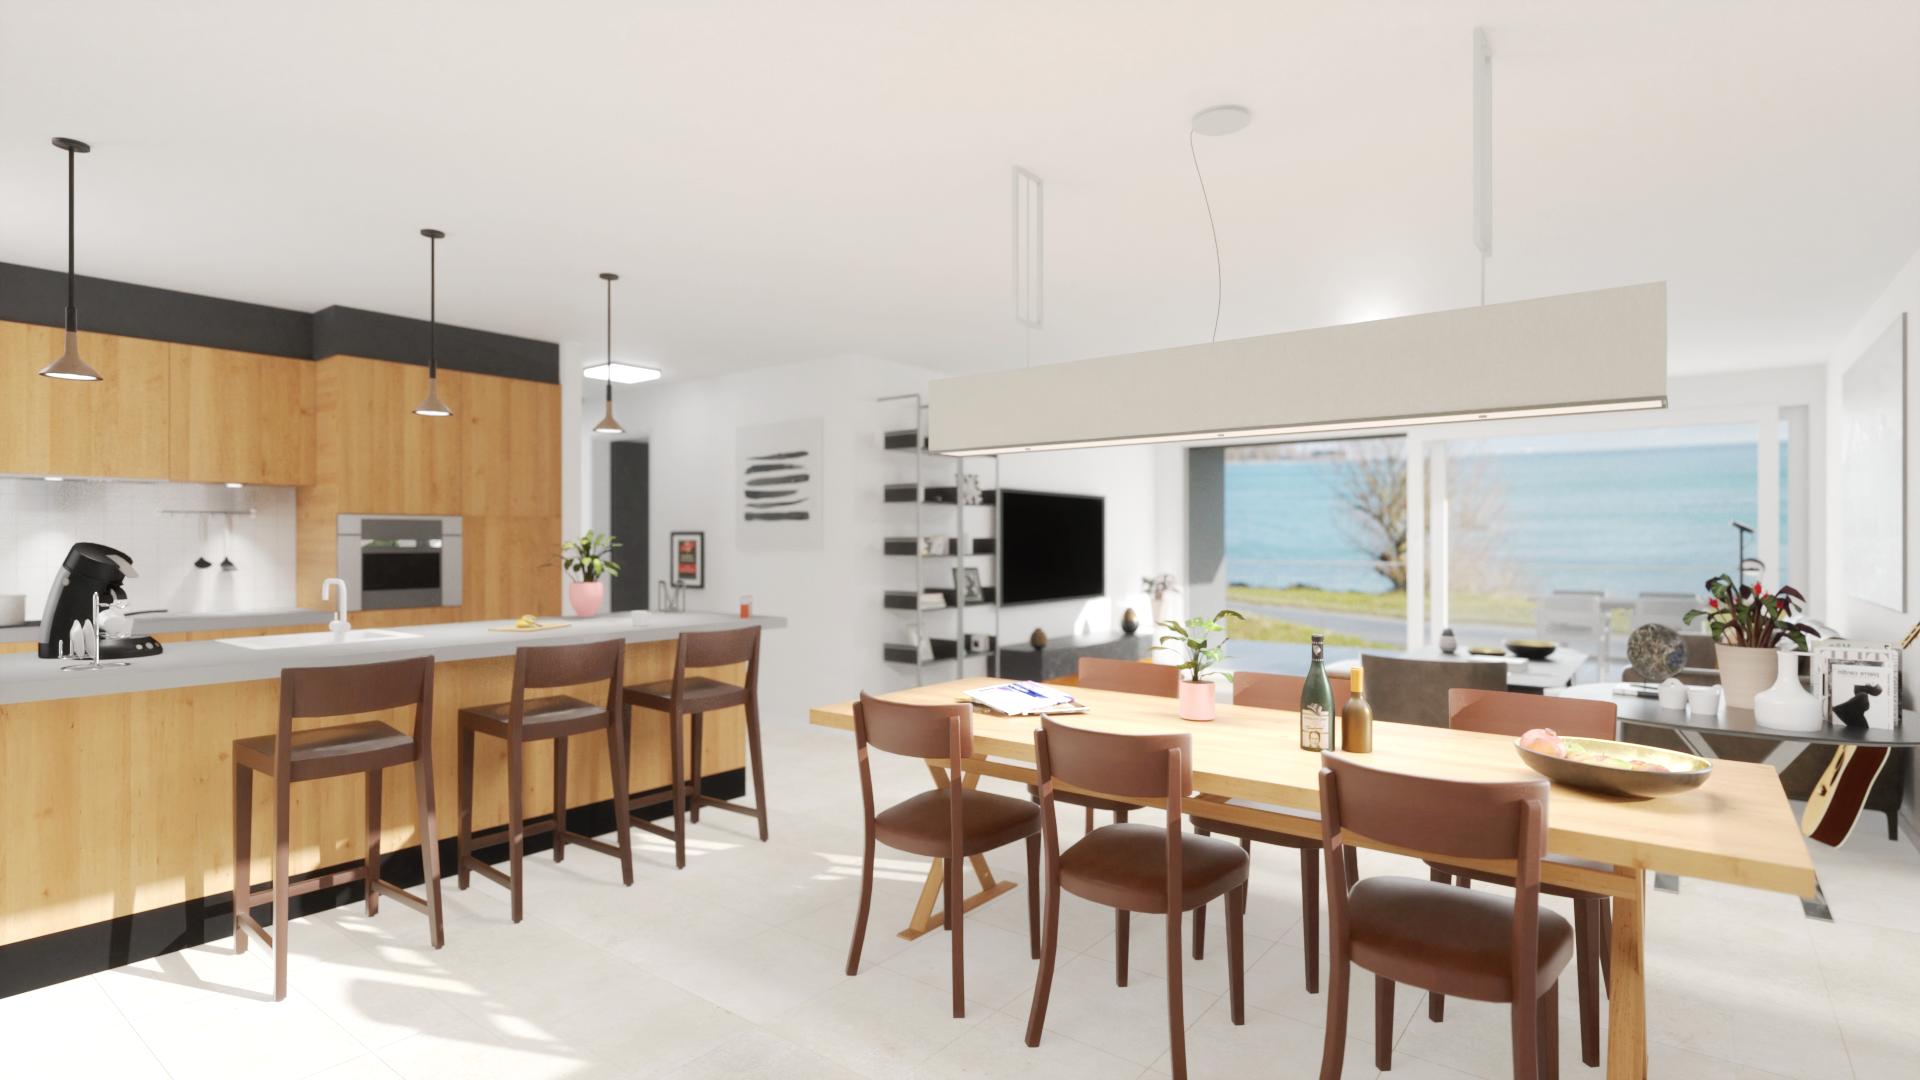 Demo Vidy Appartement en VR et Immersion 3D